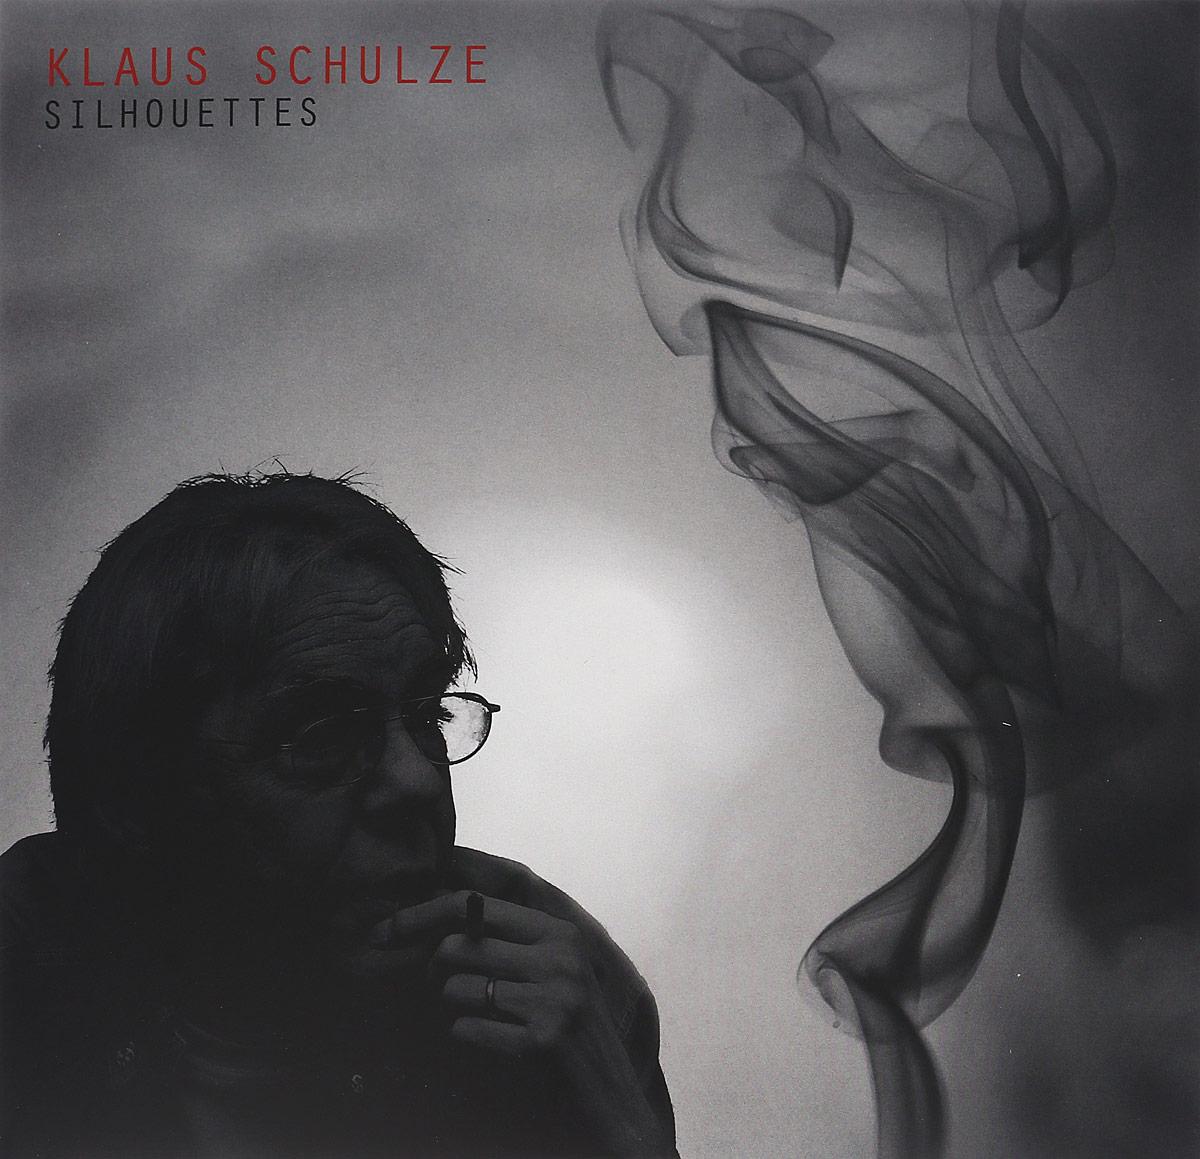 Клаус Шульце Klaus Schulze. Silhouettes (2 LP+CD) клаус шульце klaus schulze dig it cd dvd